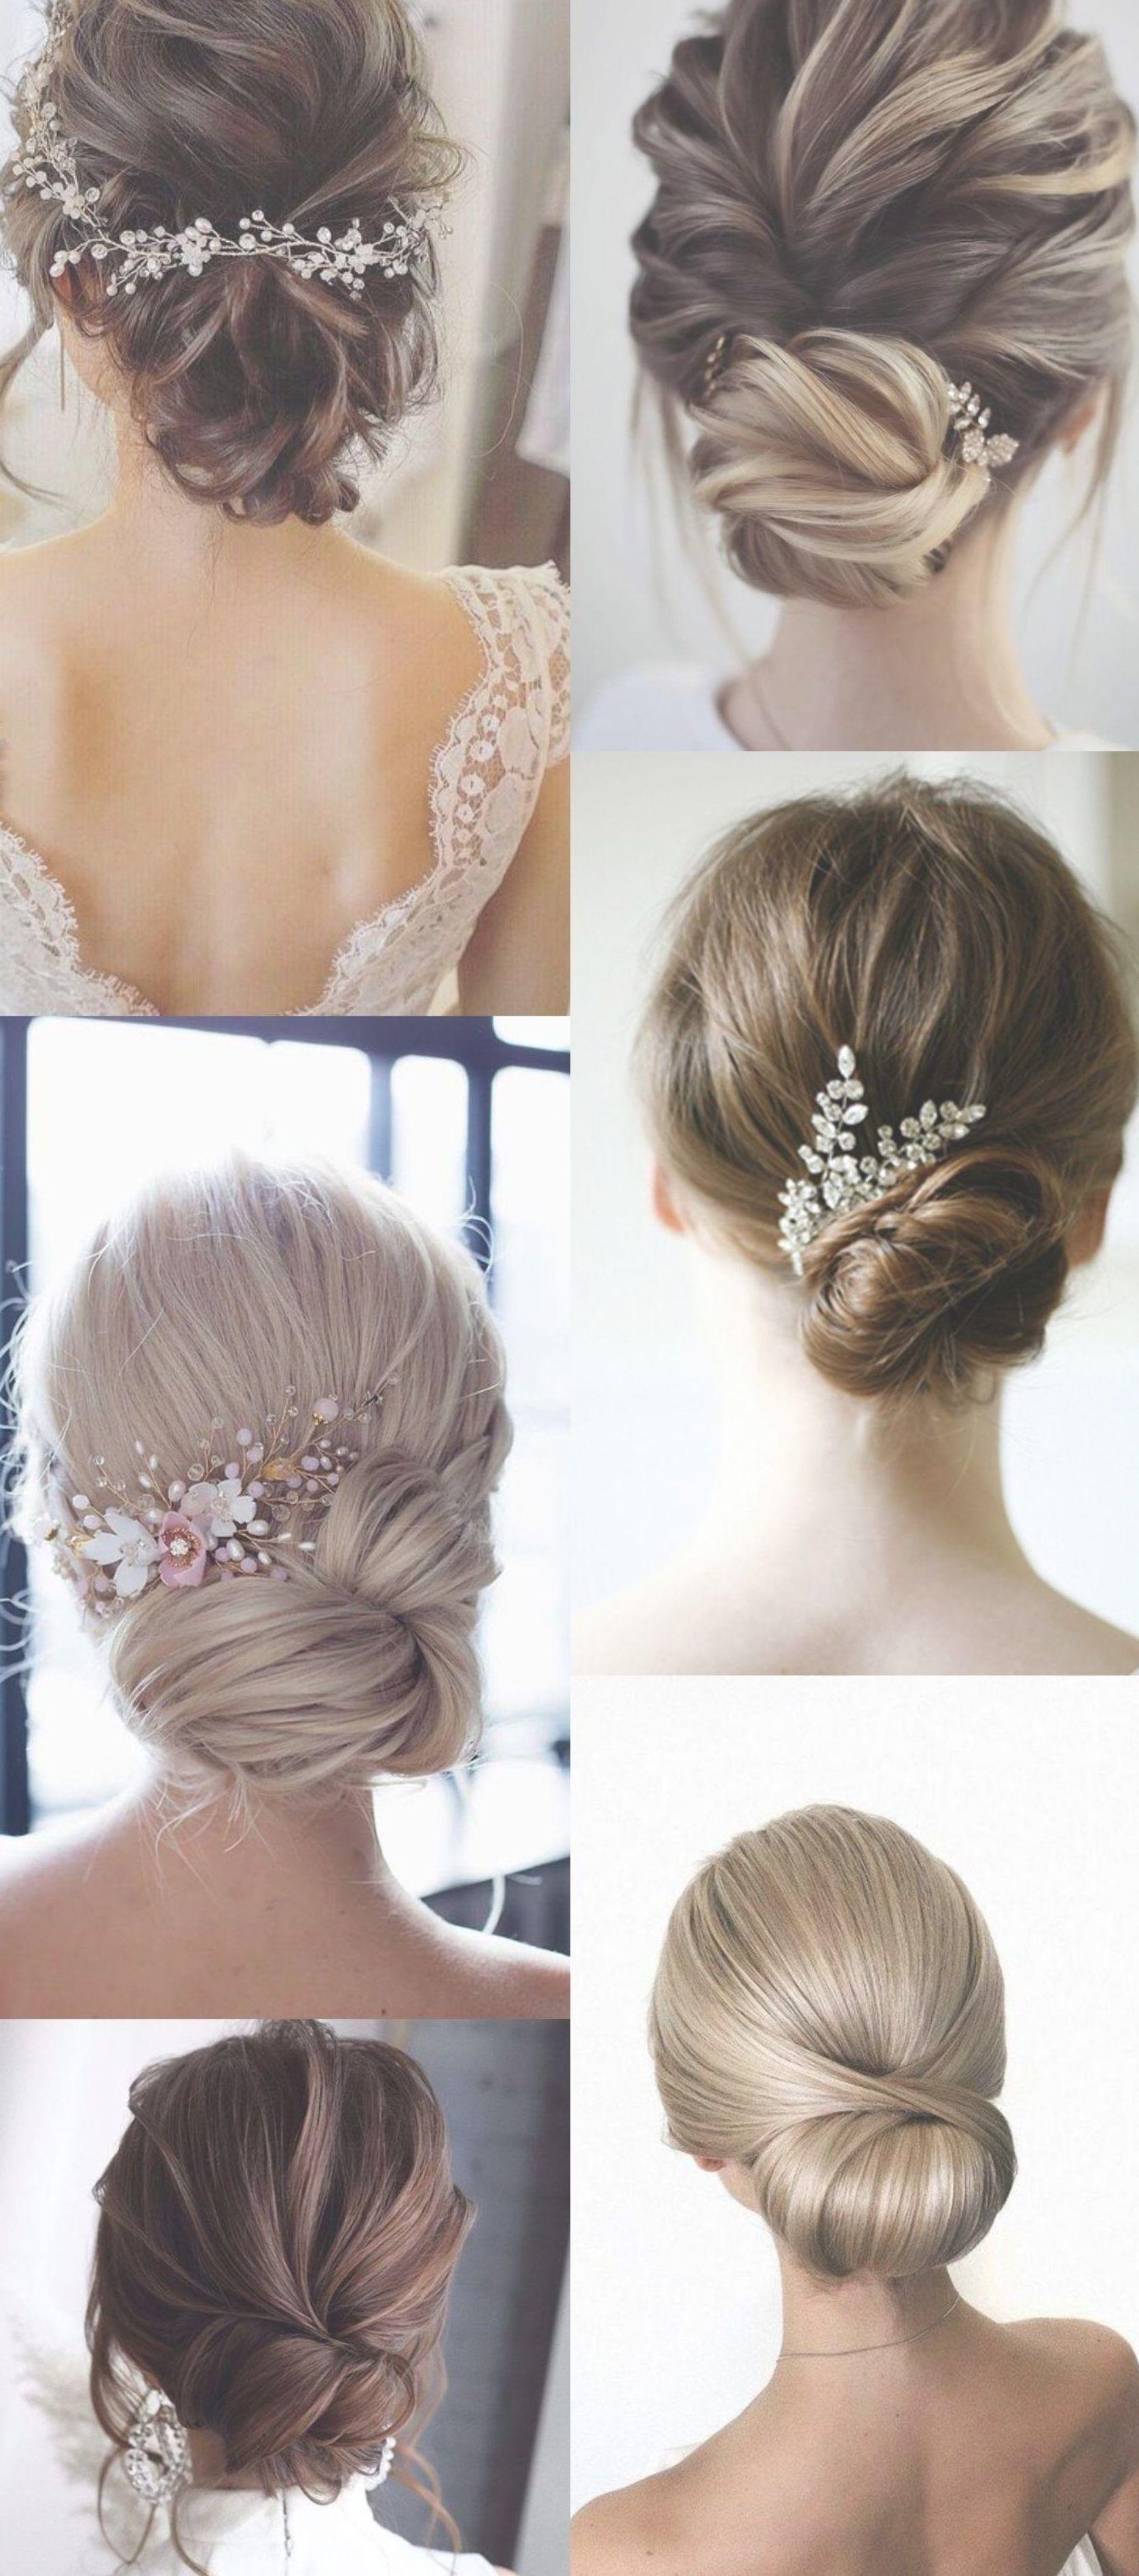 wedding hairstyle ideas  Bridal hair, Hair styles, Hair scarf styles